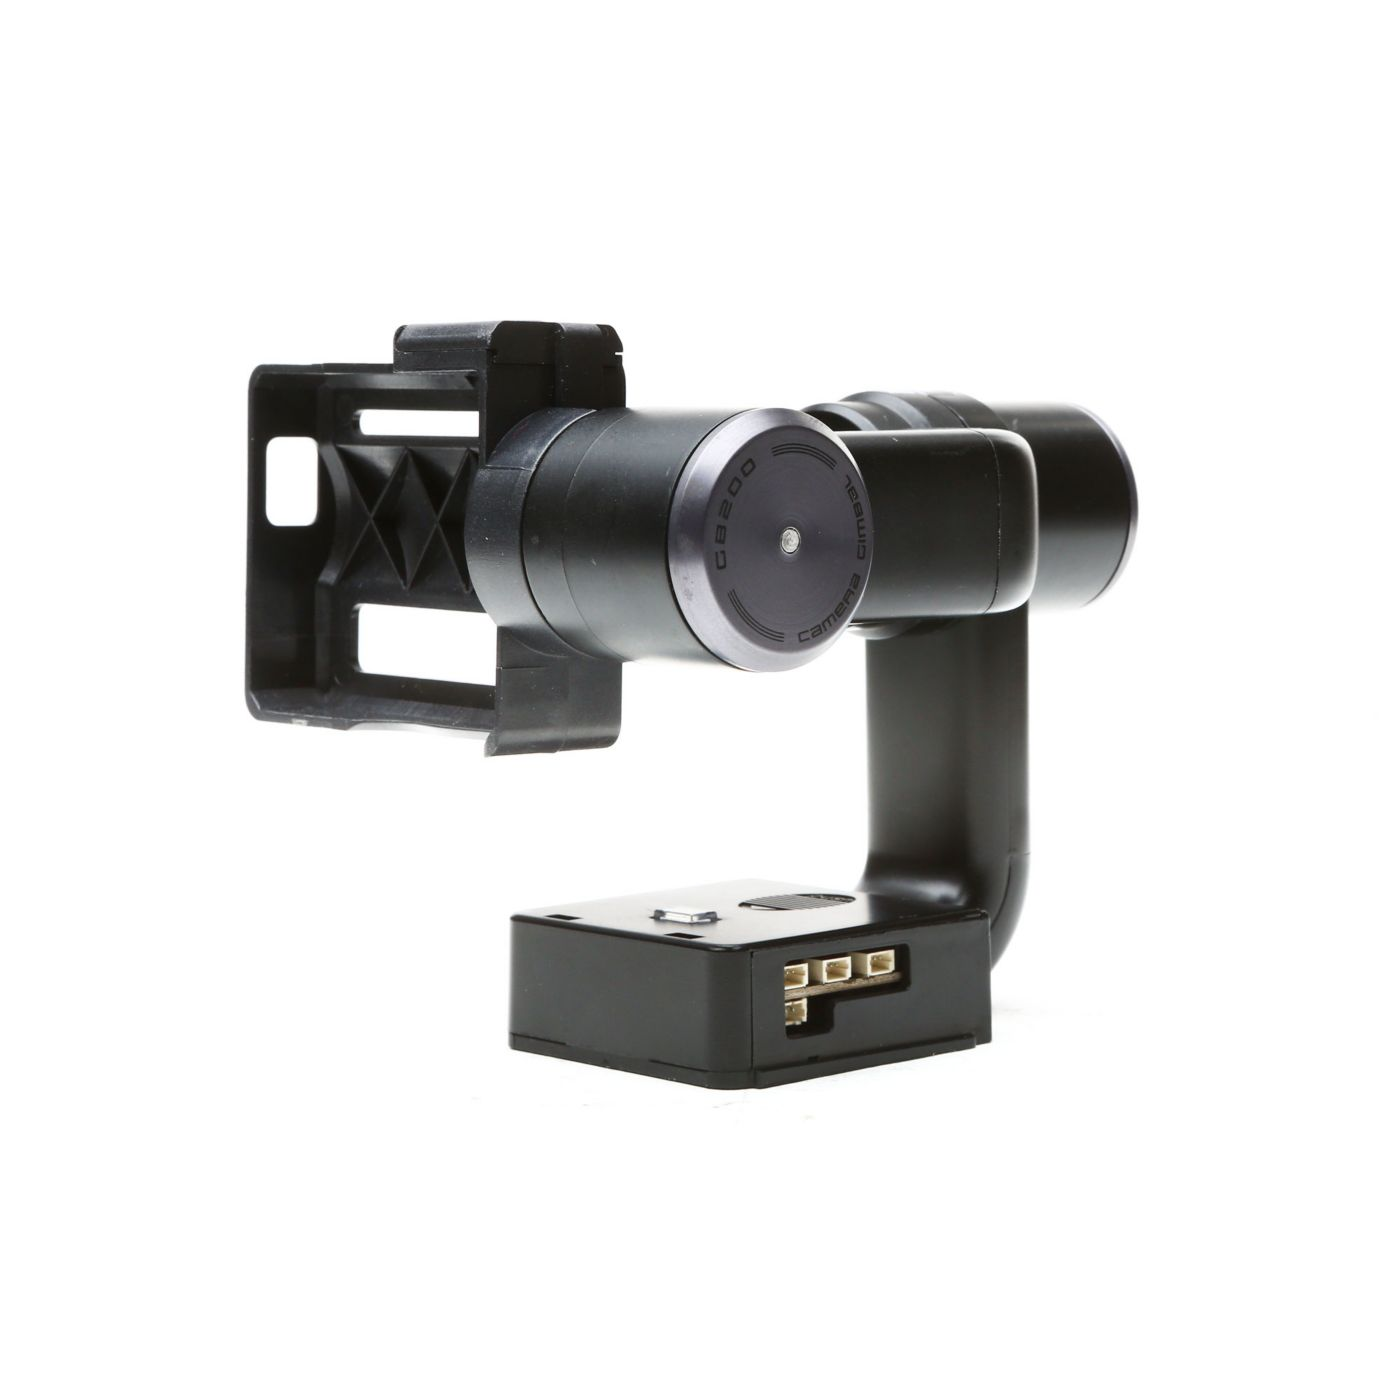 Gb200 brushless gimbal for blade 350 qx camera mounts horizon hobby